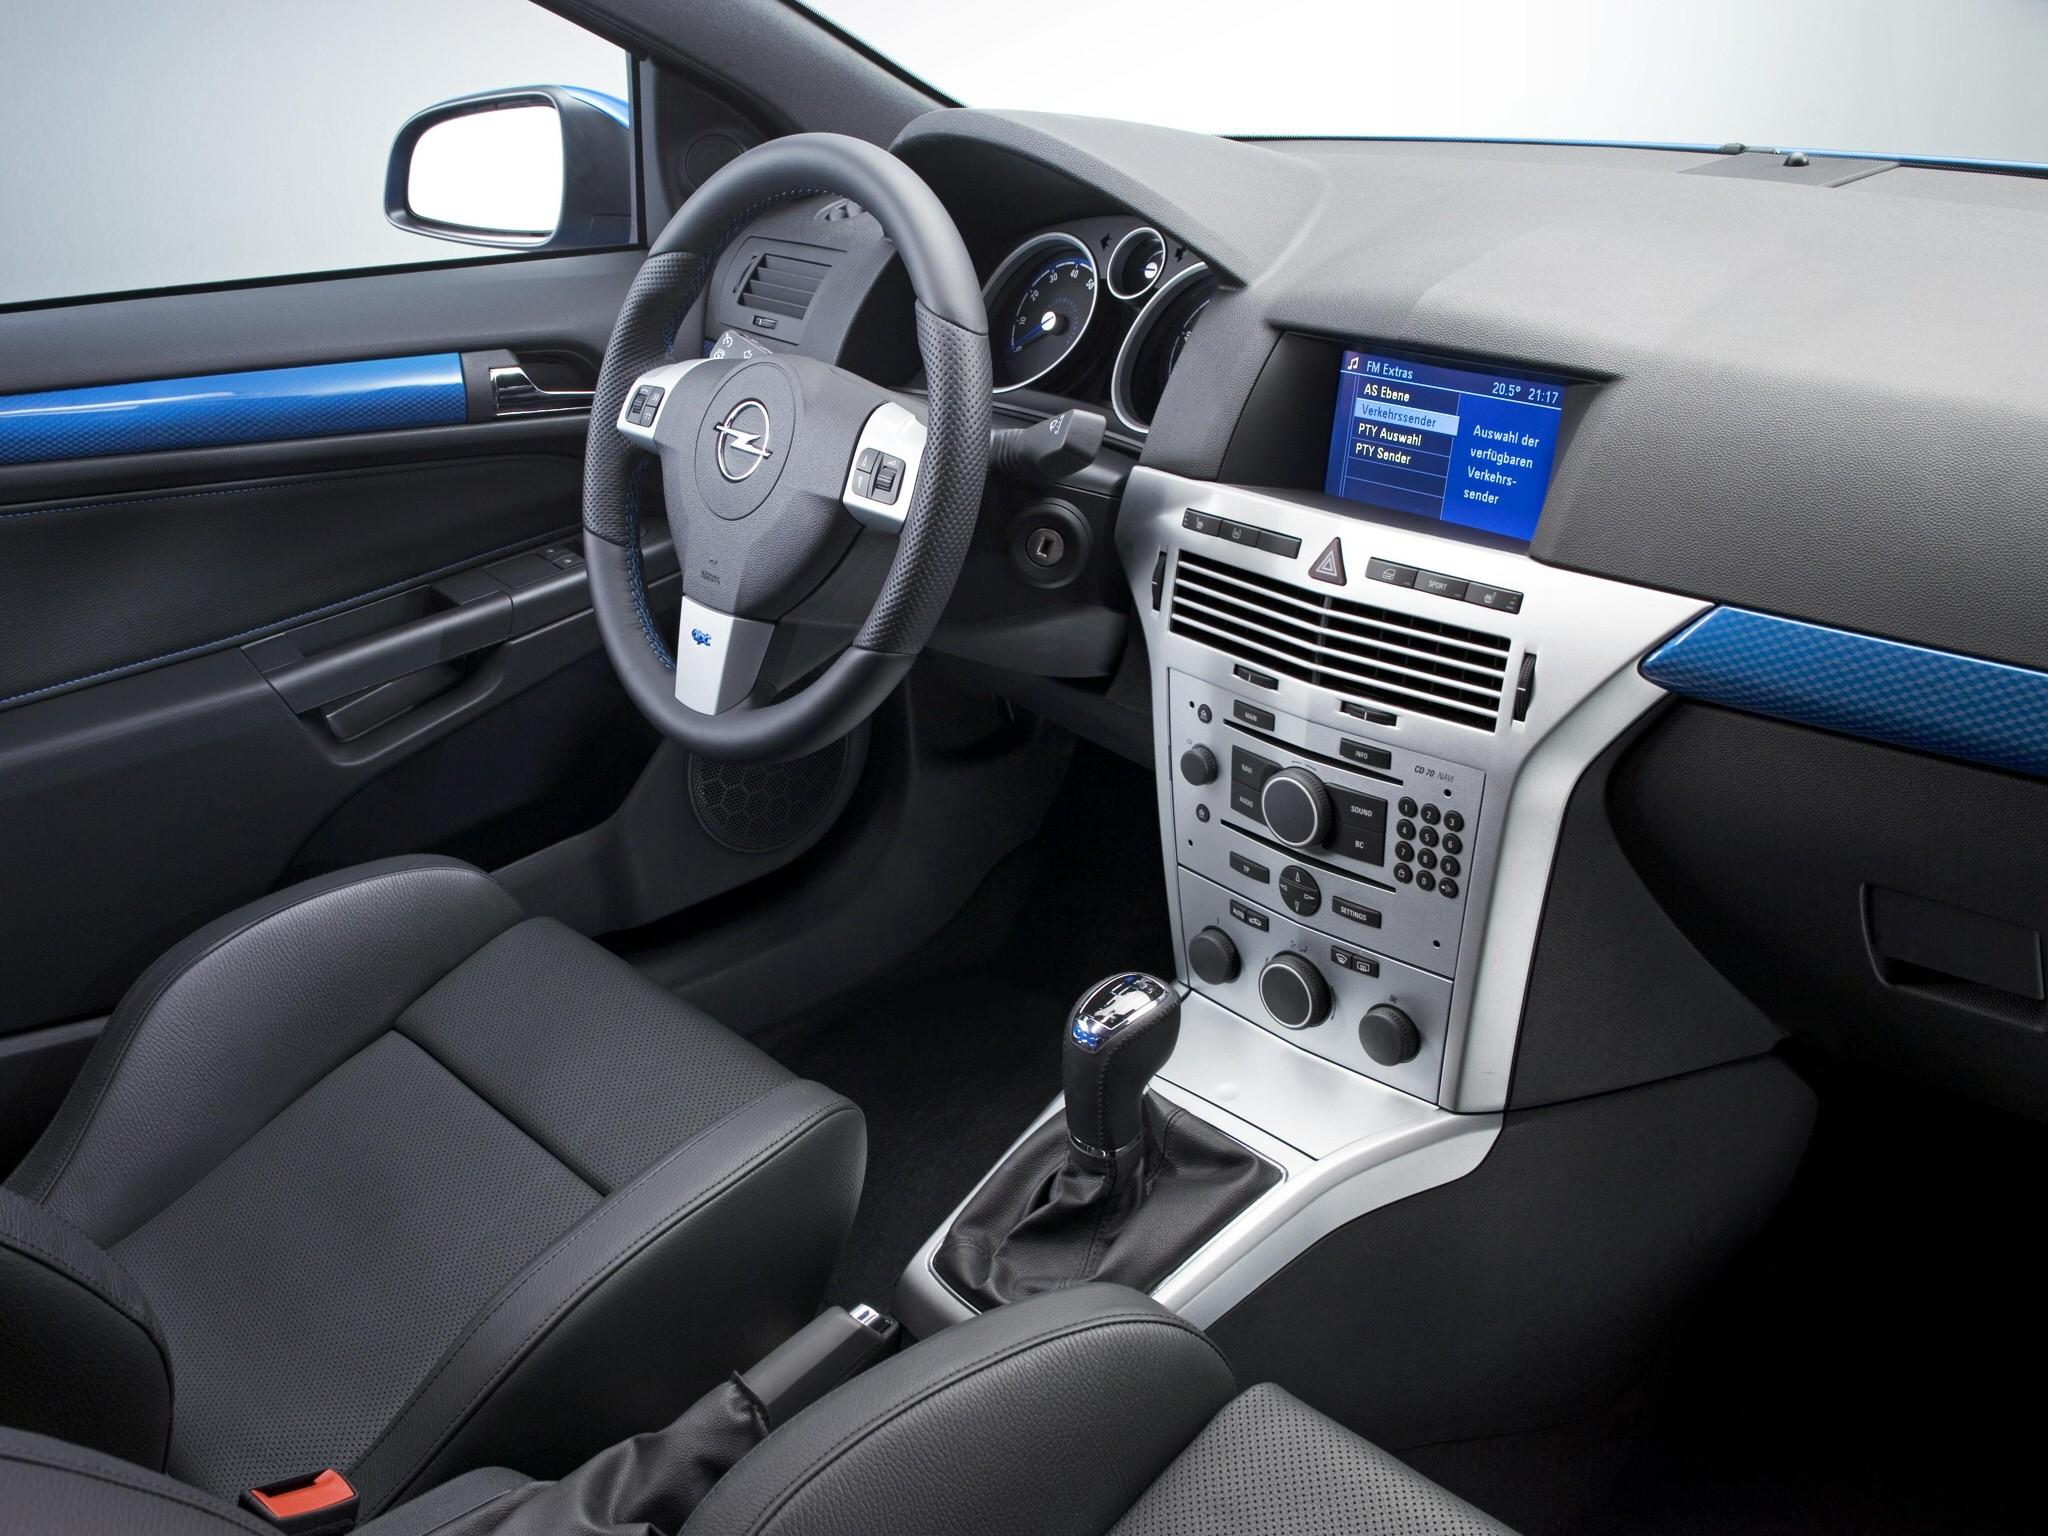 OPEL Astra 3 Doors (GTC) OPC specs & photos - 2005, 2006, 2007, 2008 ...